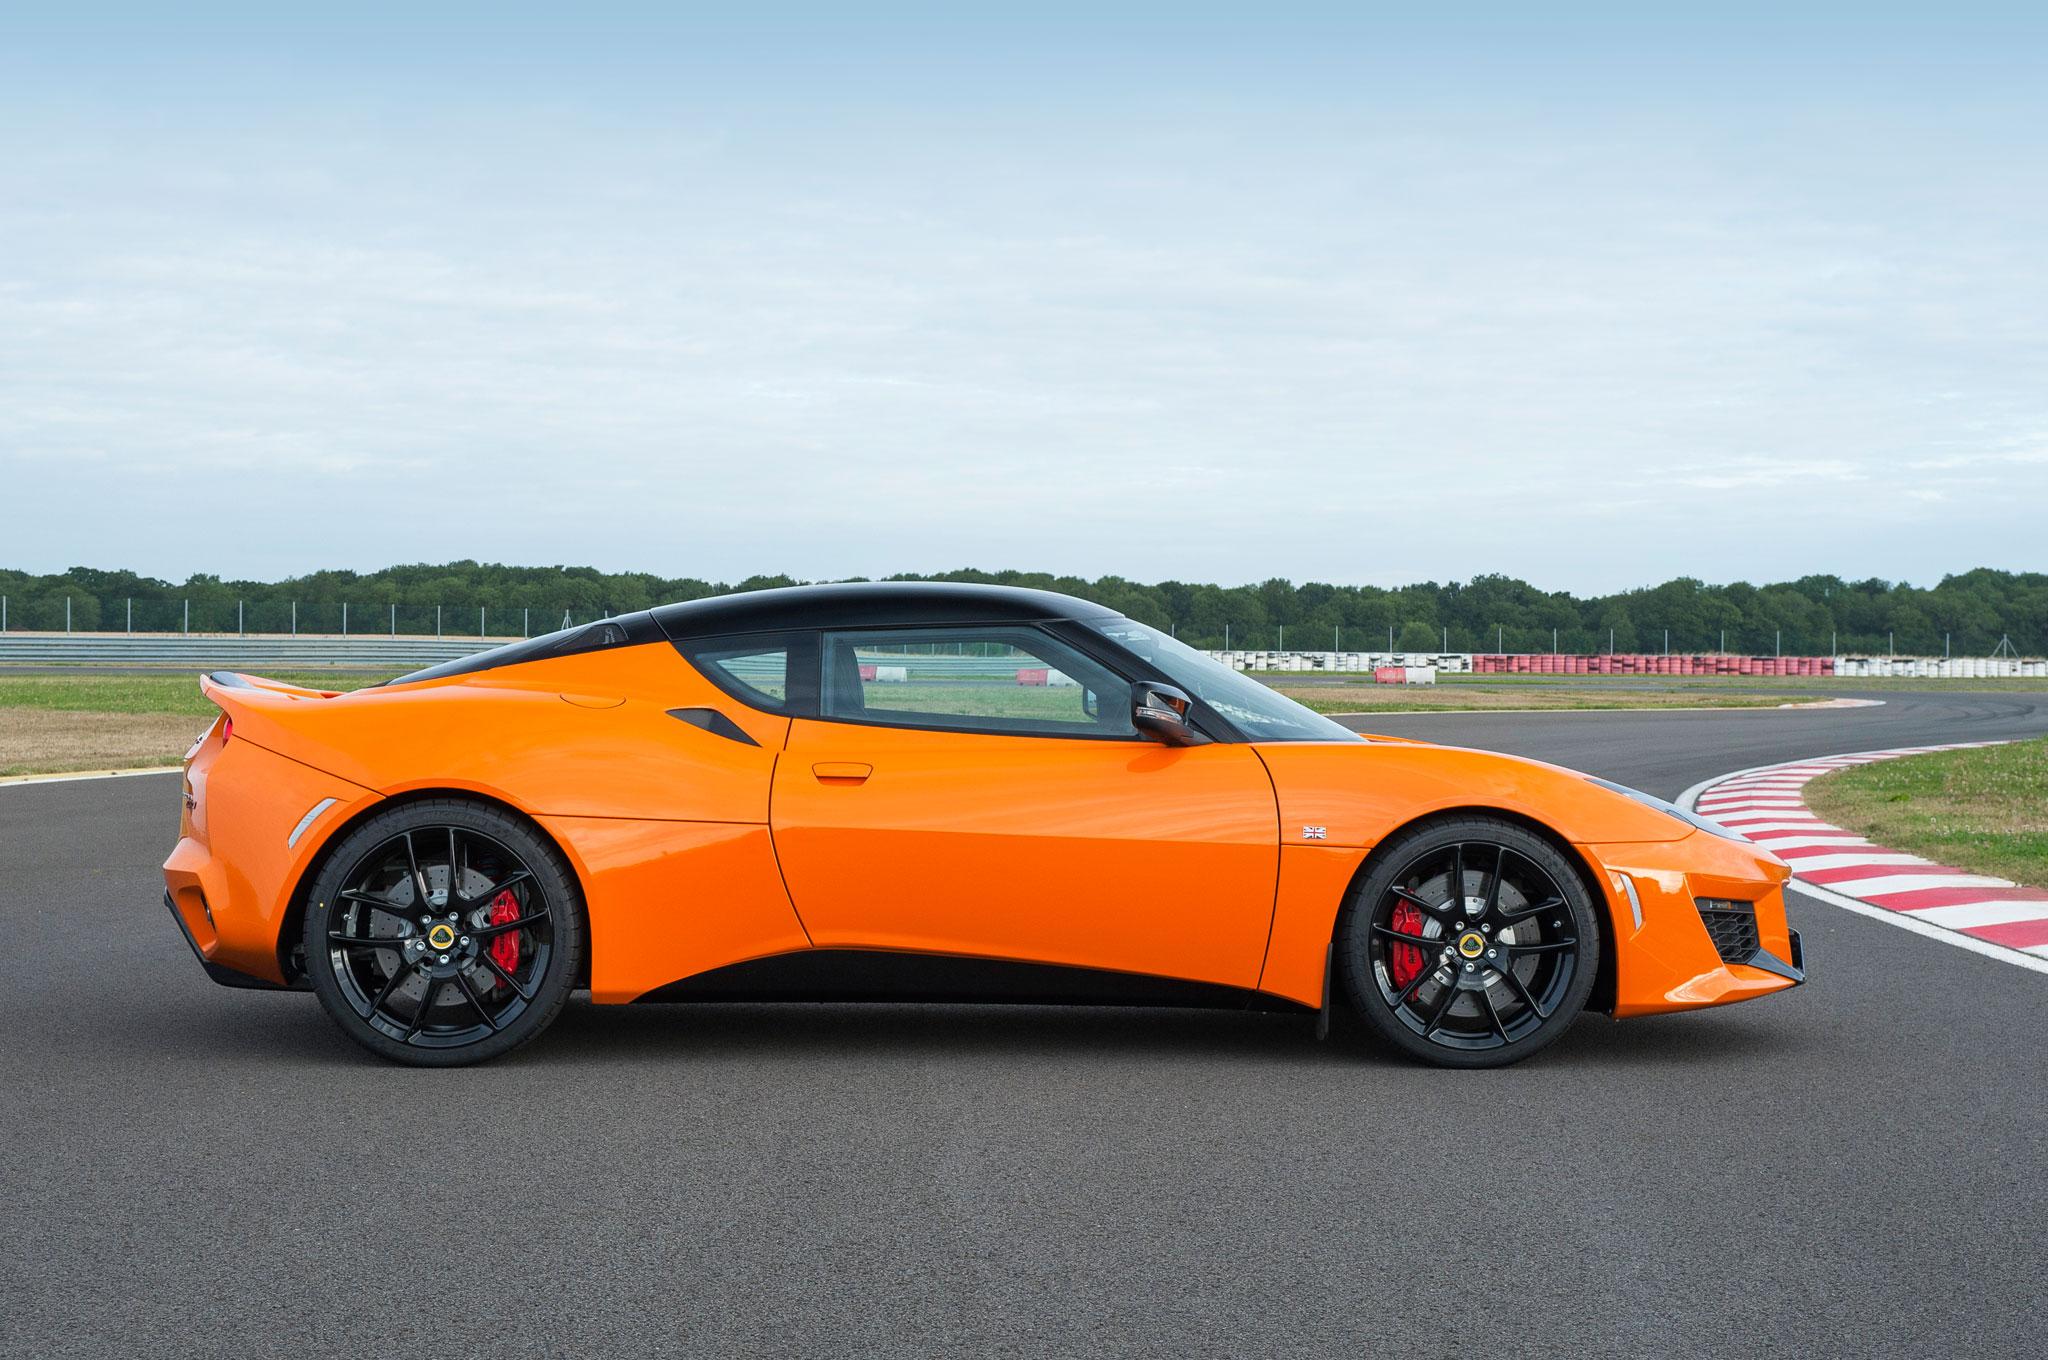 http://st.automobilemag.com/uploads/sites/11/2015/08/2016-Lotus-Evora-400-side-profile.jpg